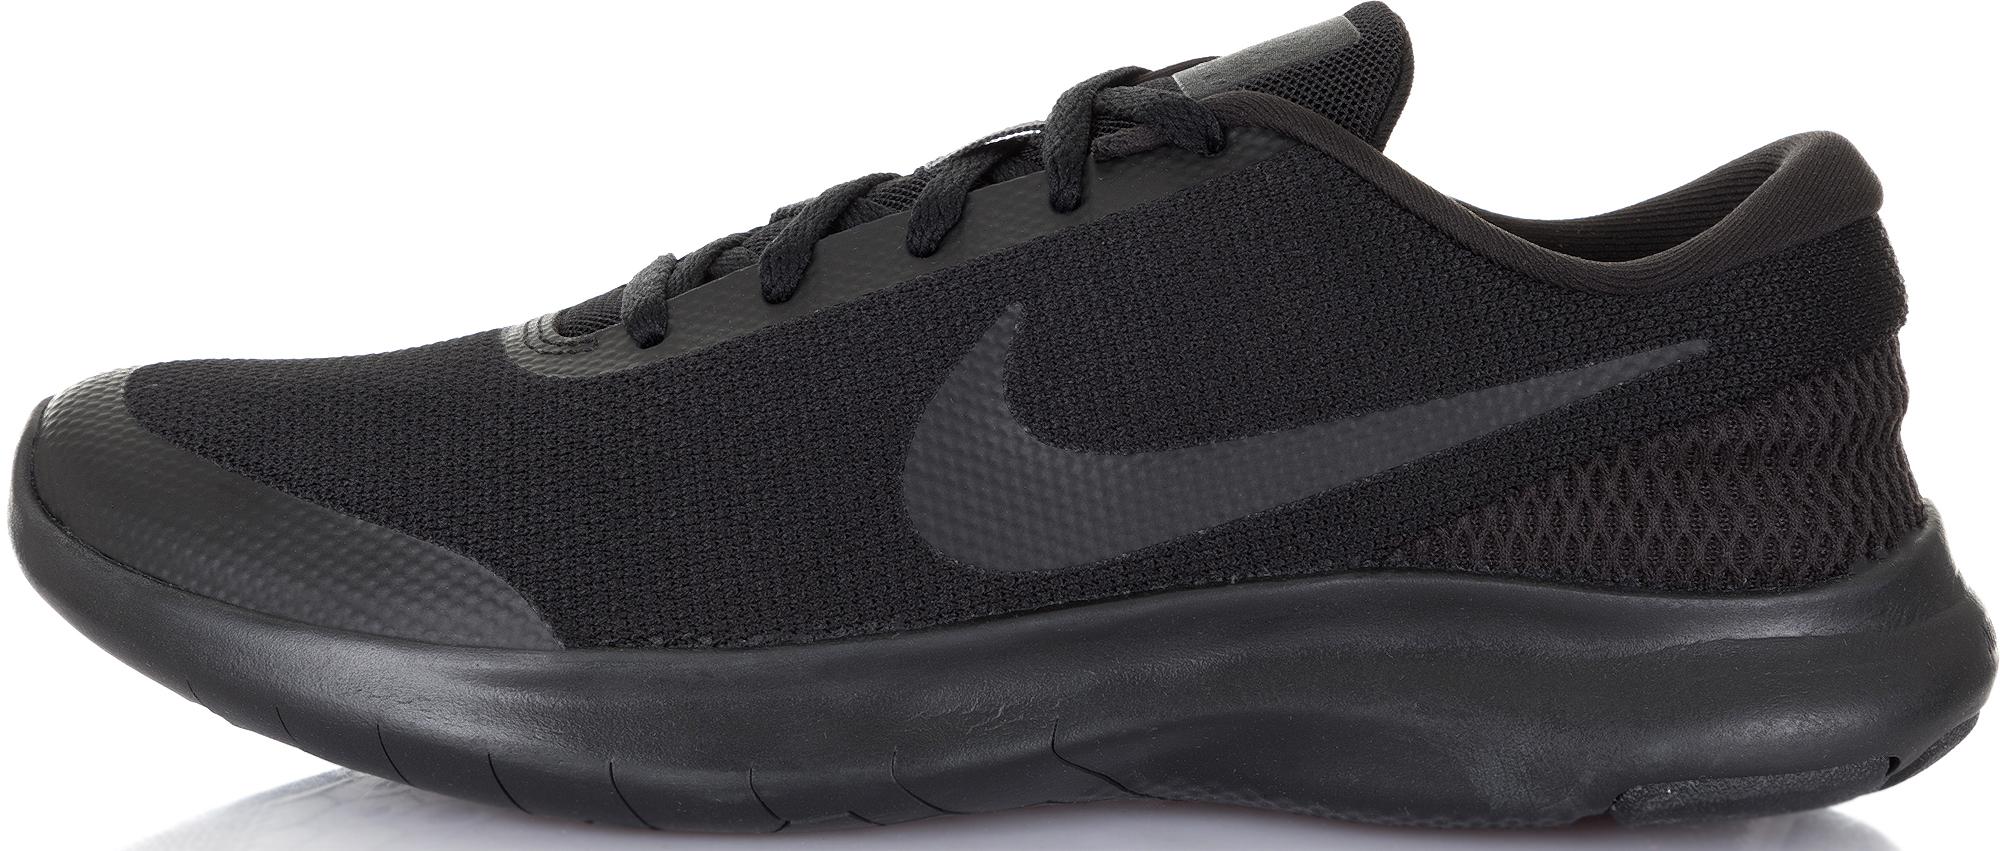 Nike Кроссовки женские Nike Flex Experience RN 7, размер 40